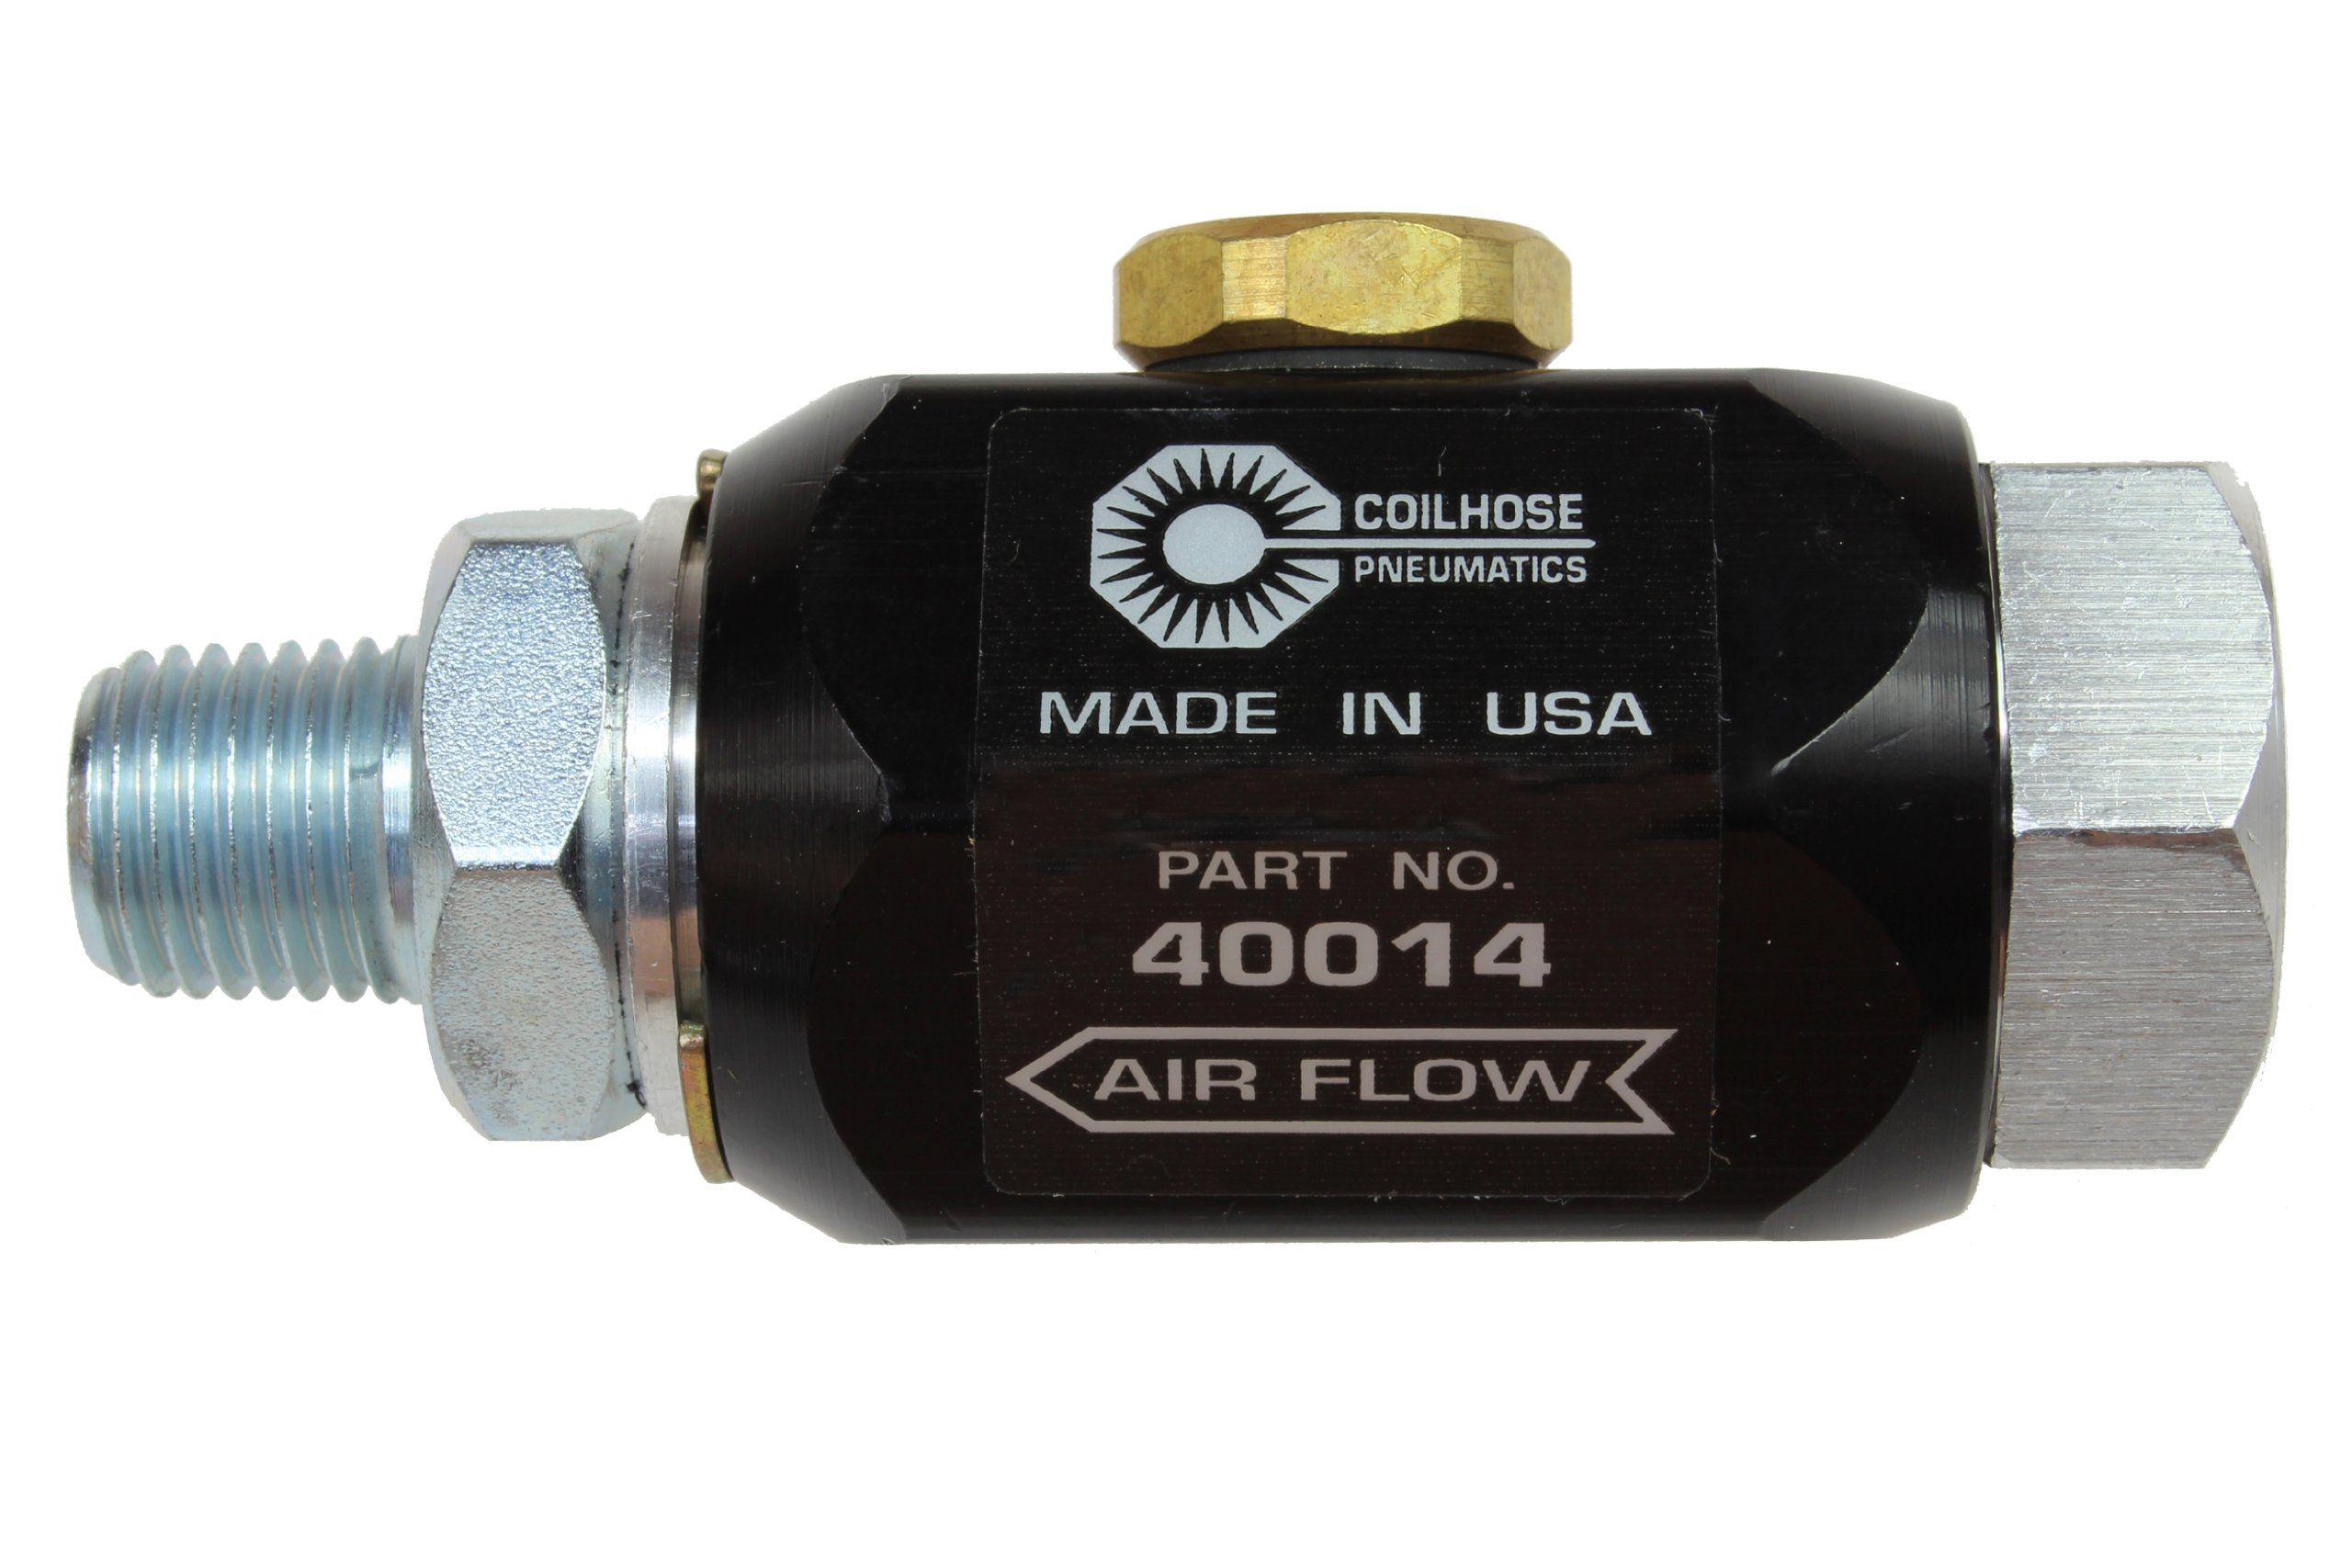 Coilhose Pneumatics 40014 InLine Lubricator, 1/4Inch